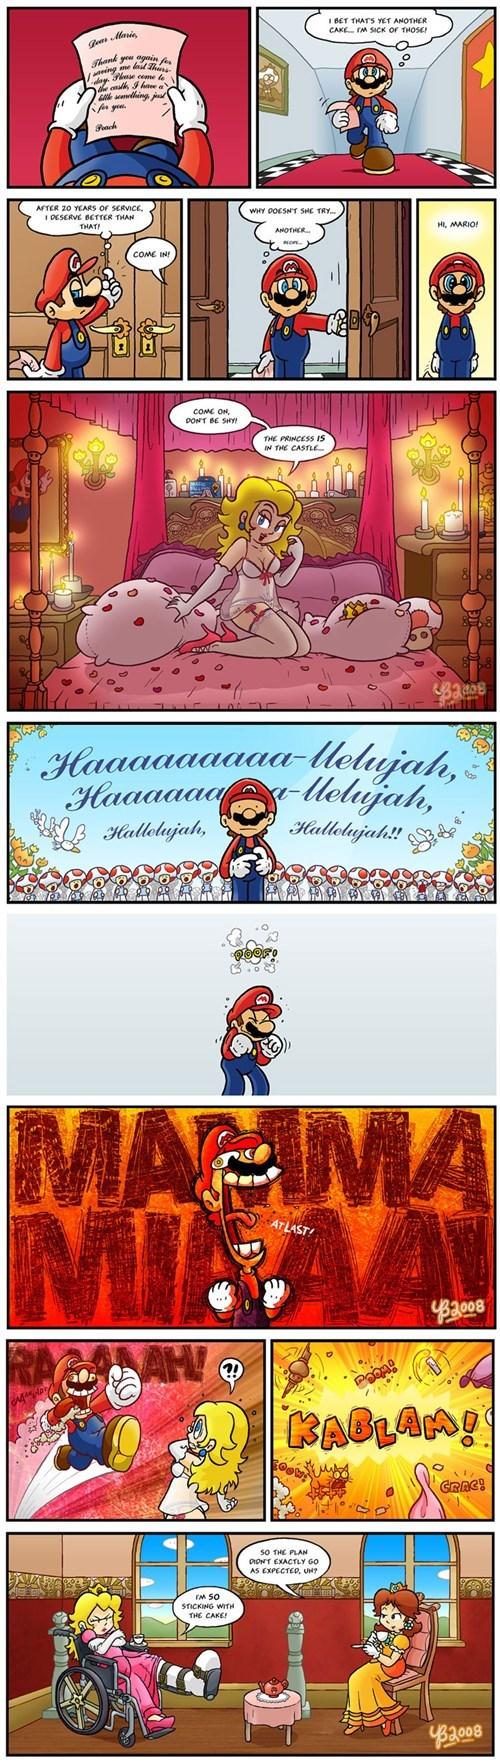 friendzone mario princess peach web comics - 8247318272